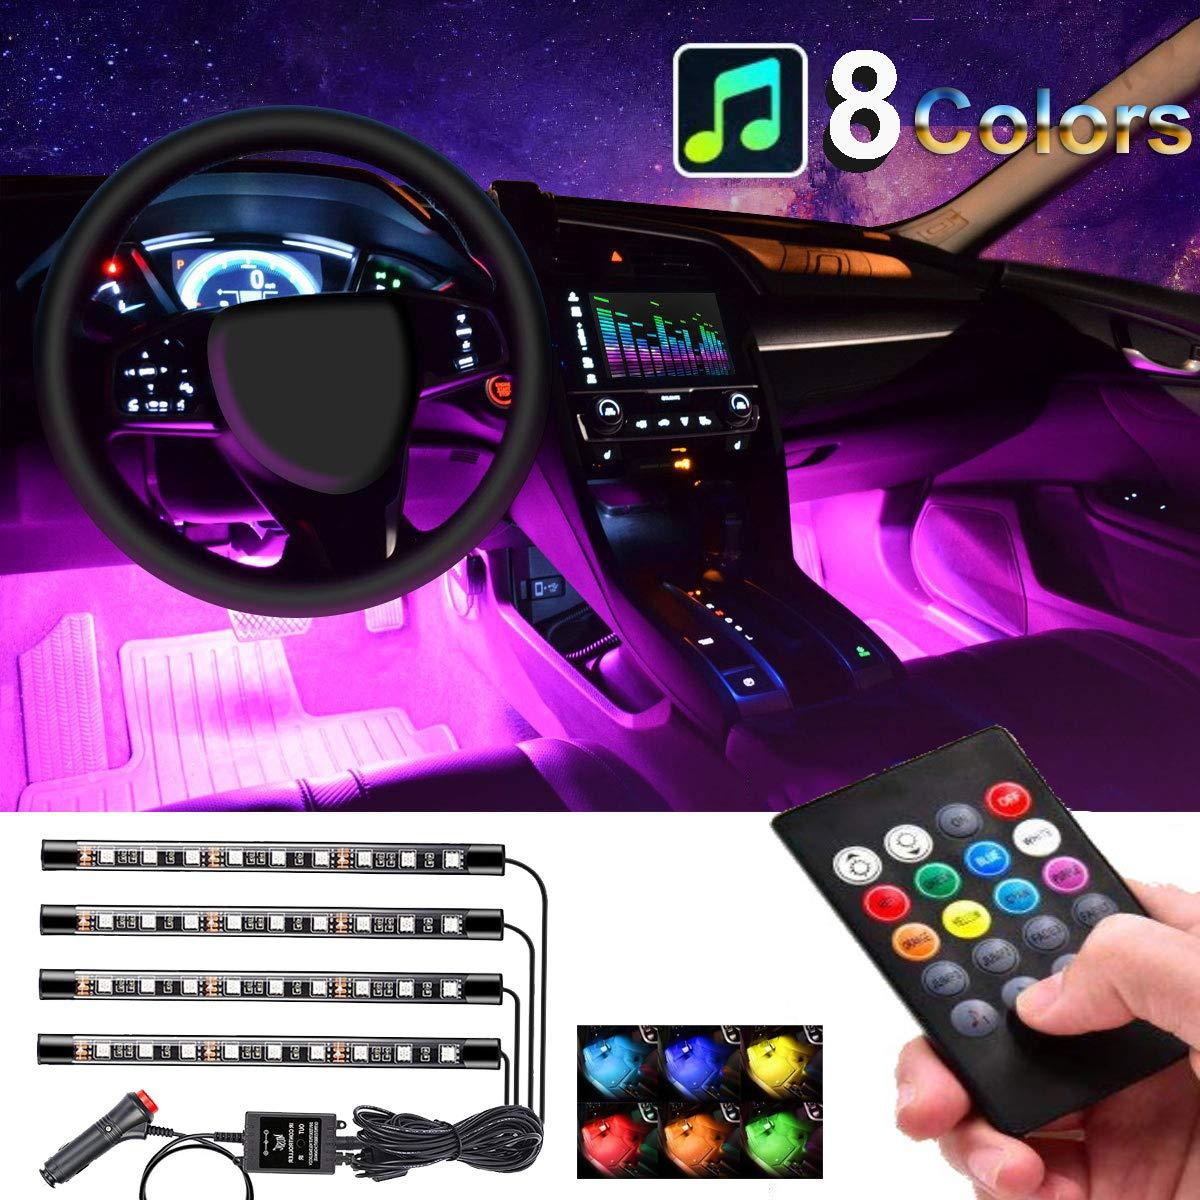 Car Interior Lights 4pcs 36 LED Car Floor Atmosphere Glow Neon lights Multi-Color Music Car LED Strip Lights Decorative Underdash Lighting Kit with Sound Active function Wireless Remote Control DC 12V